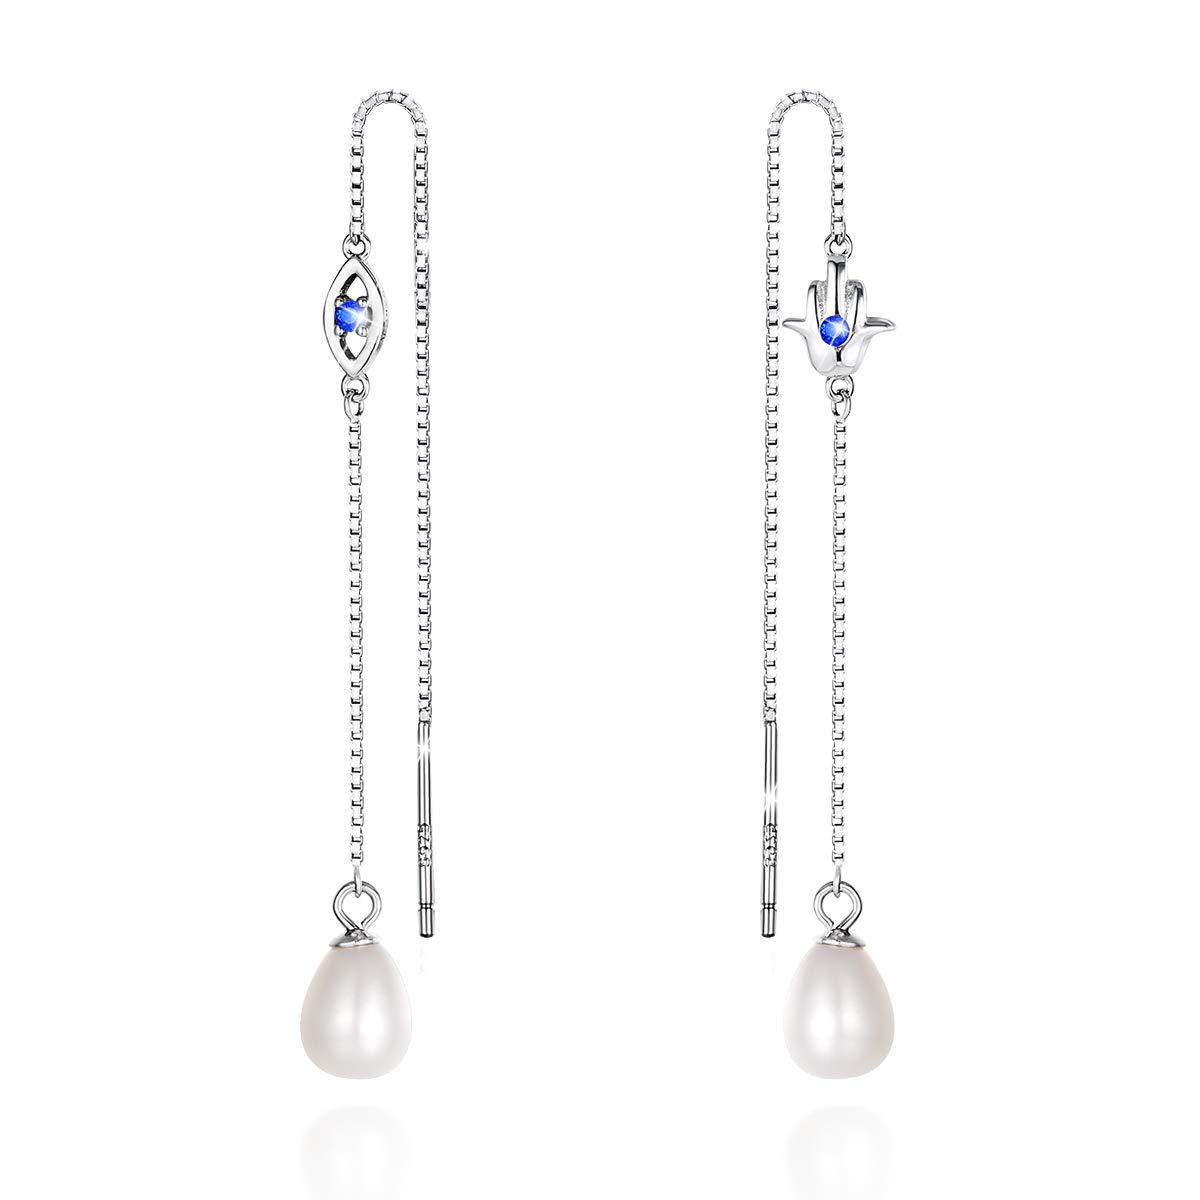 90f7f7edebd9c PEARLOVE Freshwater Pearl Long Earrings Threader Dangle Drop Earrings 925  Sterling Silver Long Chain Ear Linear Earring for Women With Gift Box